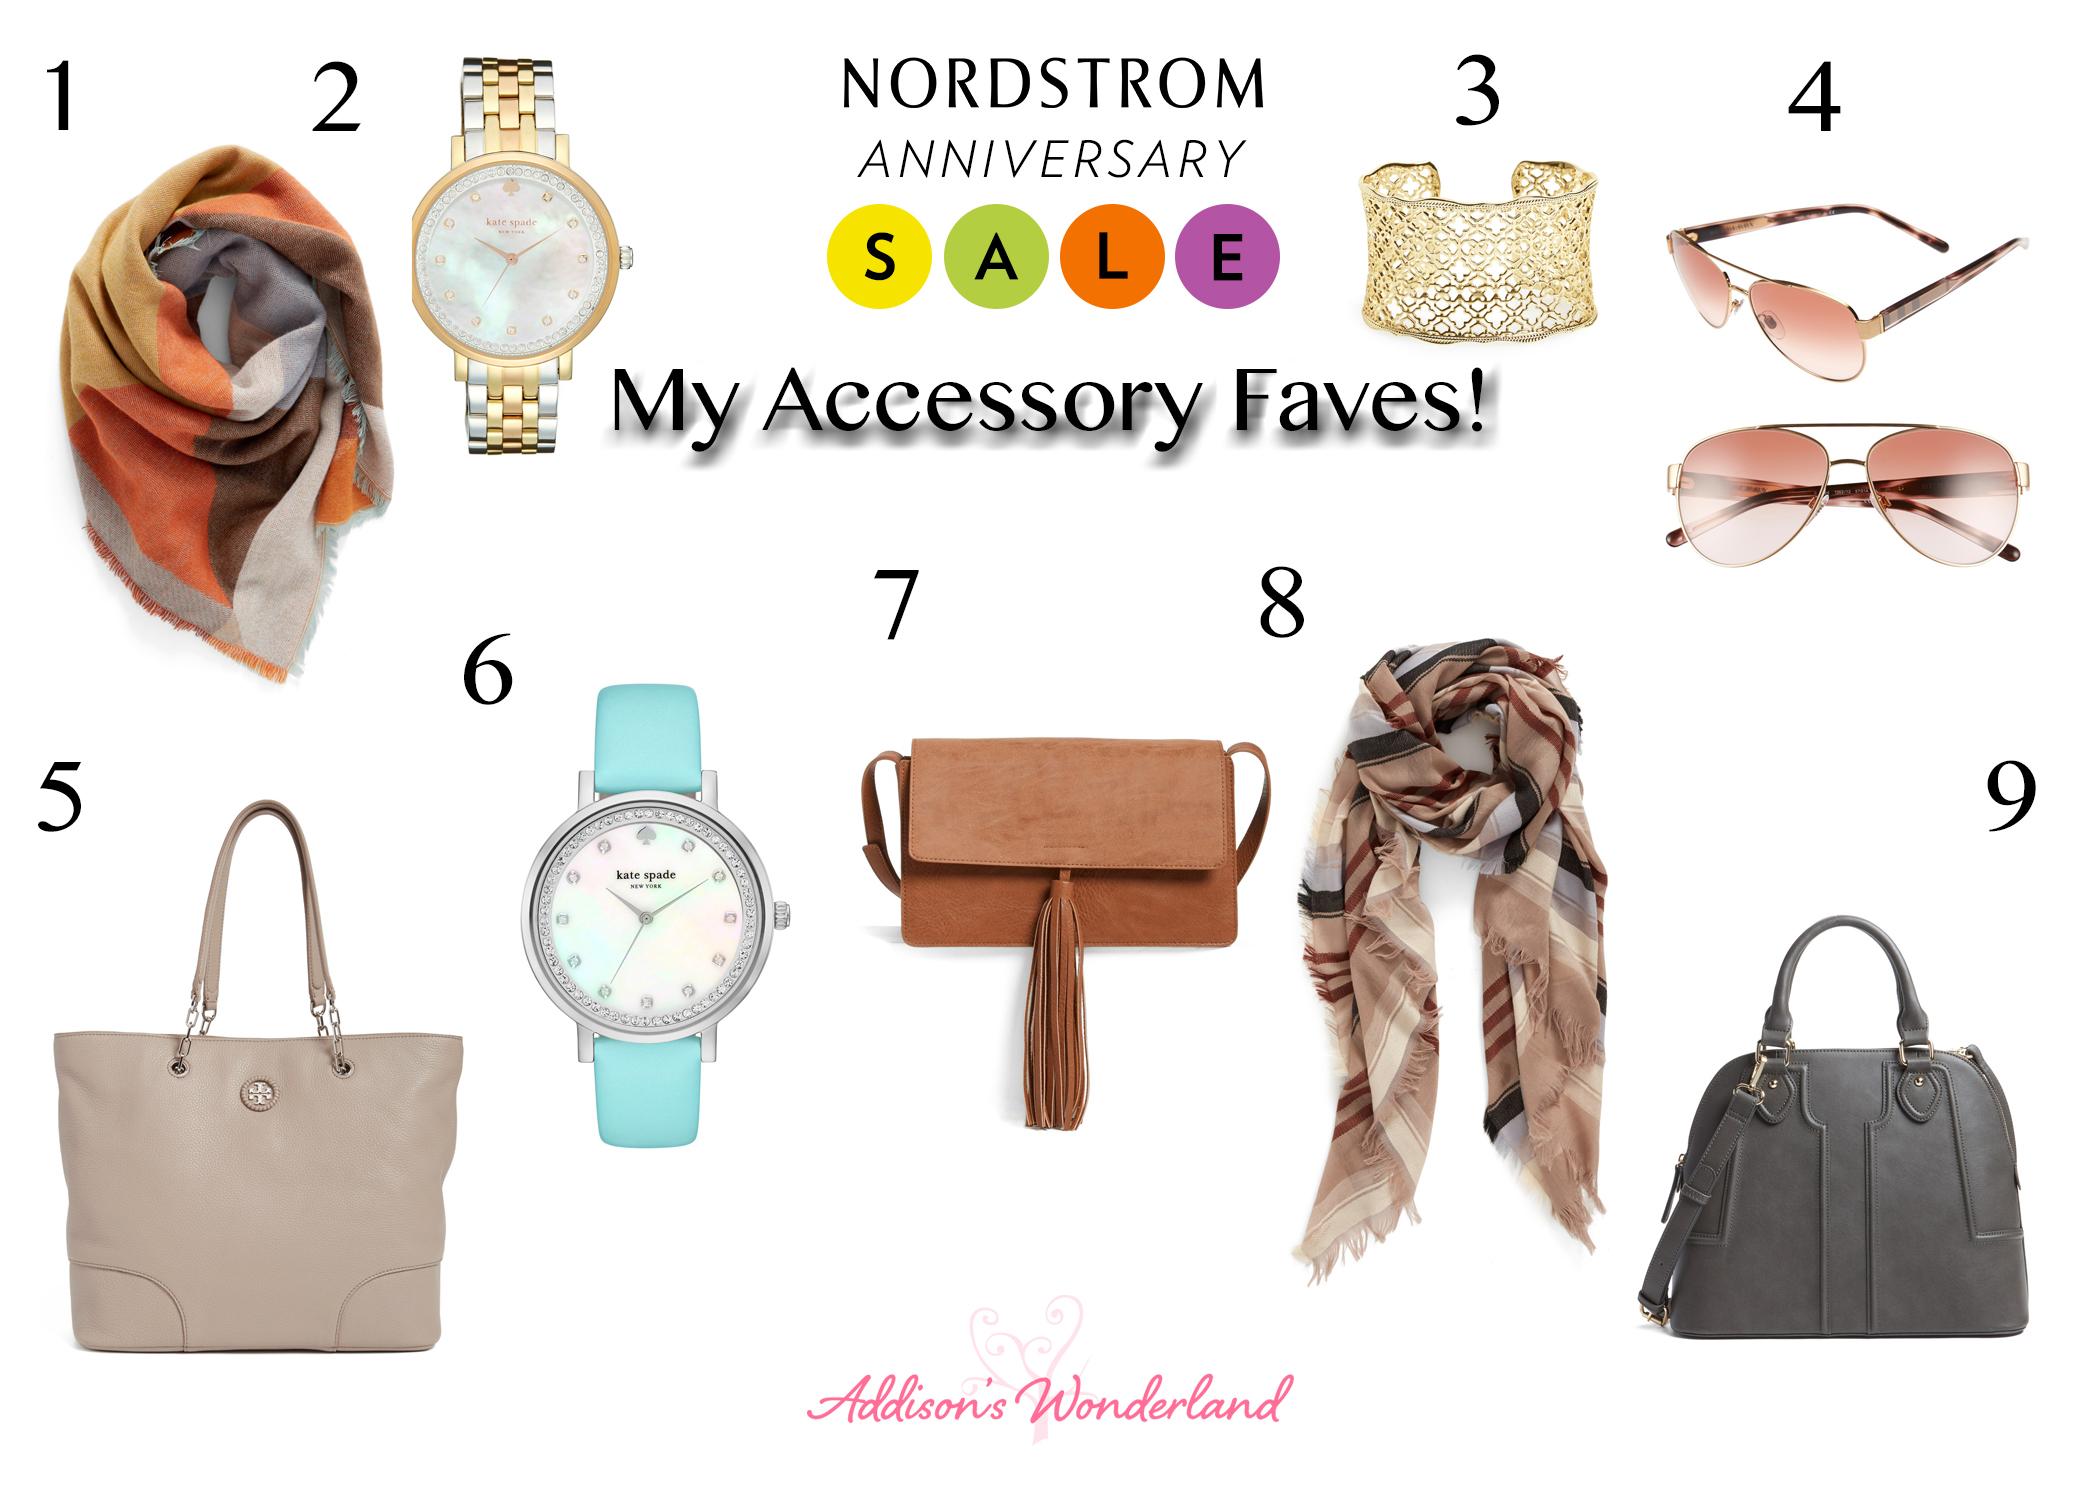 Nordstrom Anniversary Sale Accessory